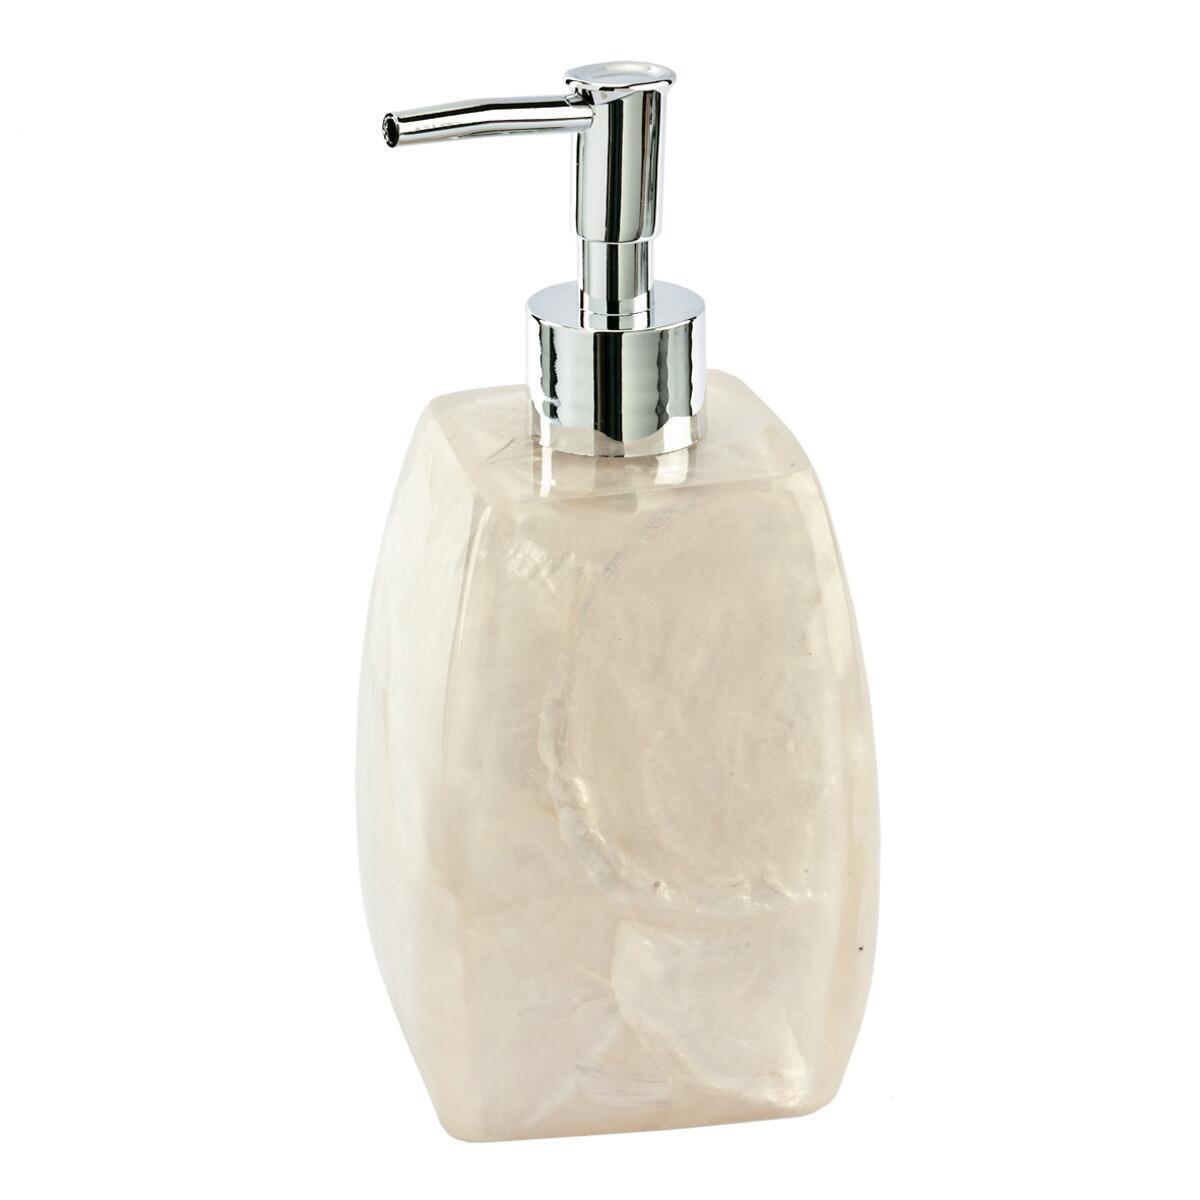 Dispenser sapone Perla beige